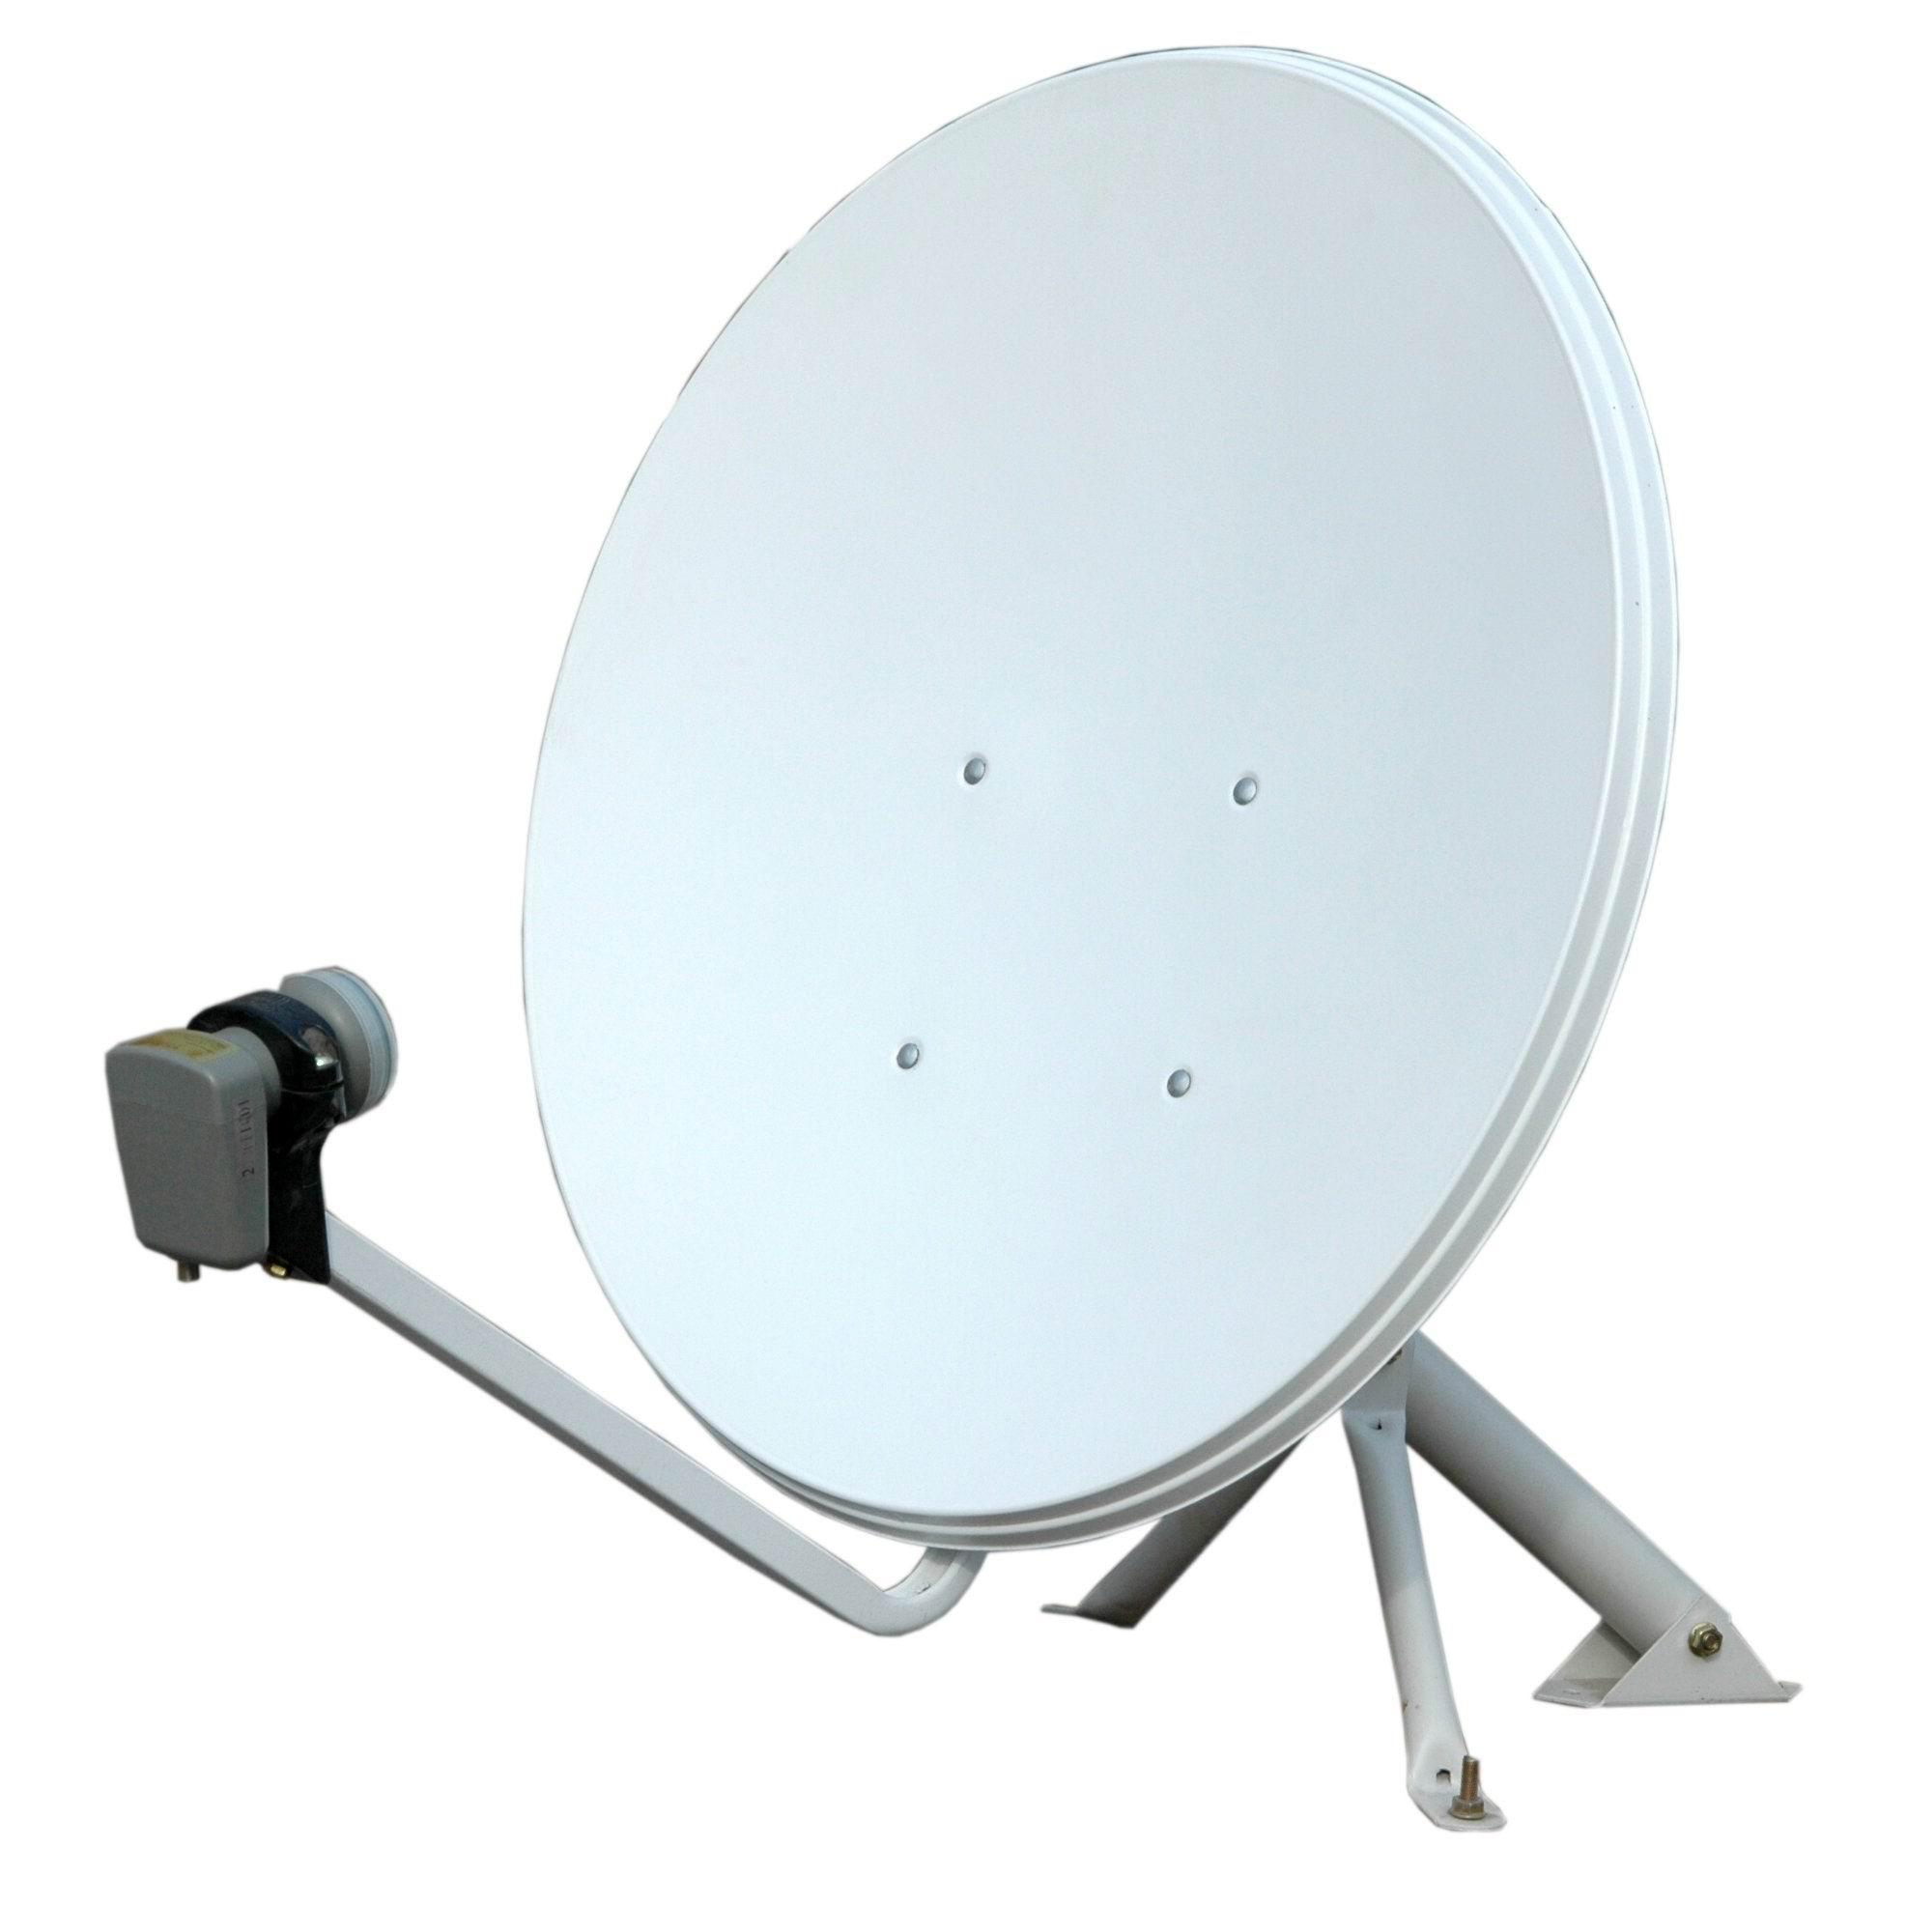 ku band 35cm satellite dish antenna buy satellite antenna antenna satellite dish antenna. Black Bedroom Furniture Sets. Home Design Ideas